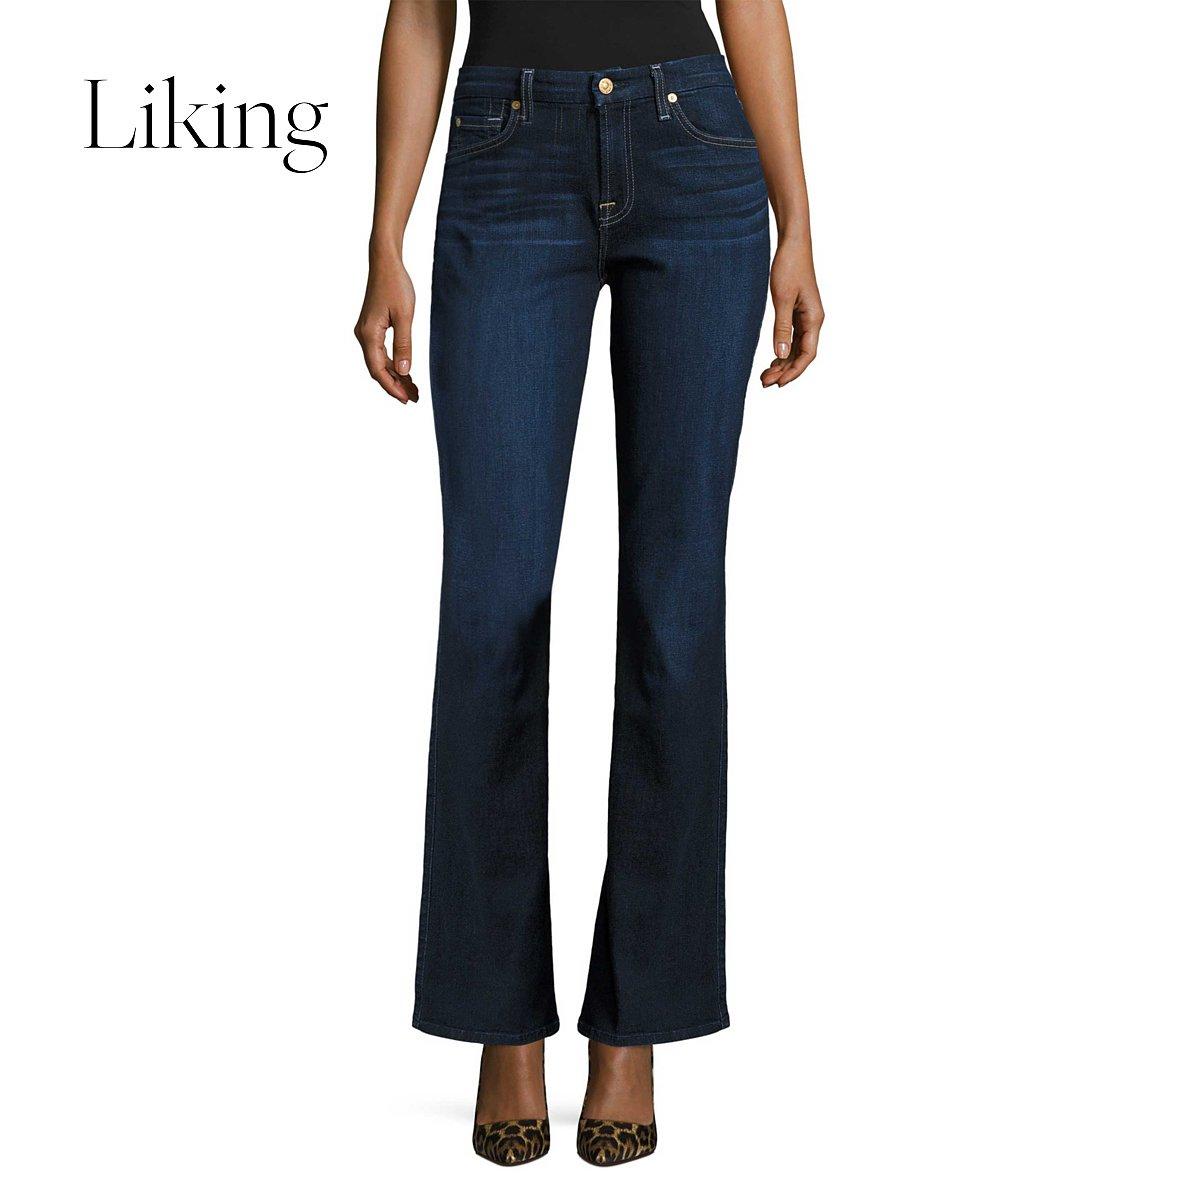 7 for all mankind game Ms. Wen Fu Ao Mander blue high waist bell bottom jeans